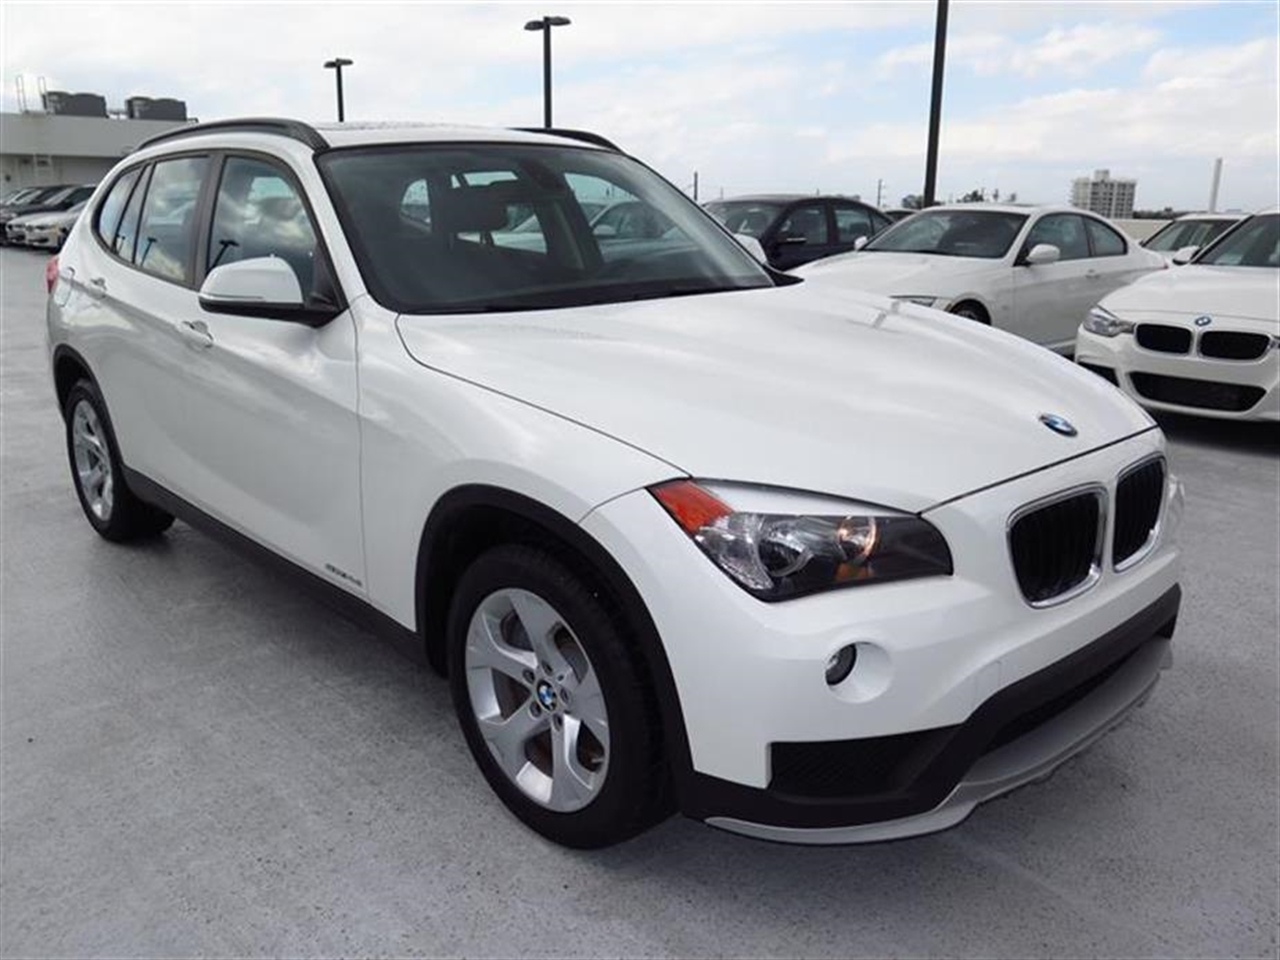 2015 BMW X1 RWD 4dr sDrive28i 11541 miles VIN WBAVM1C50FVW57414